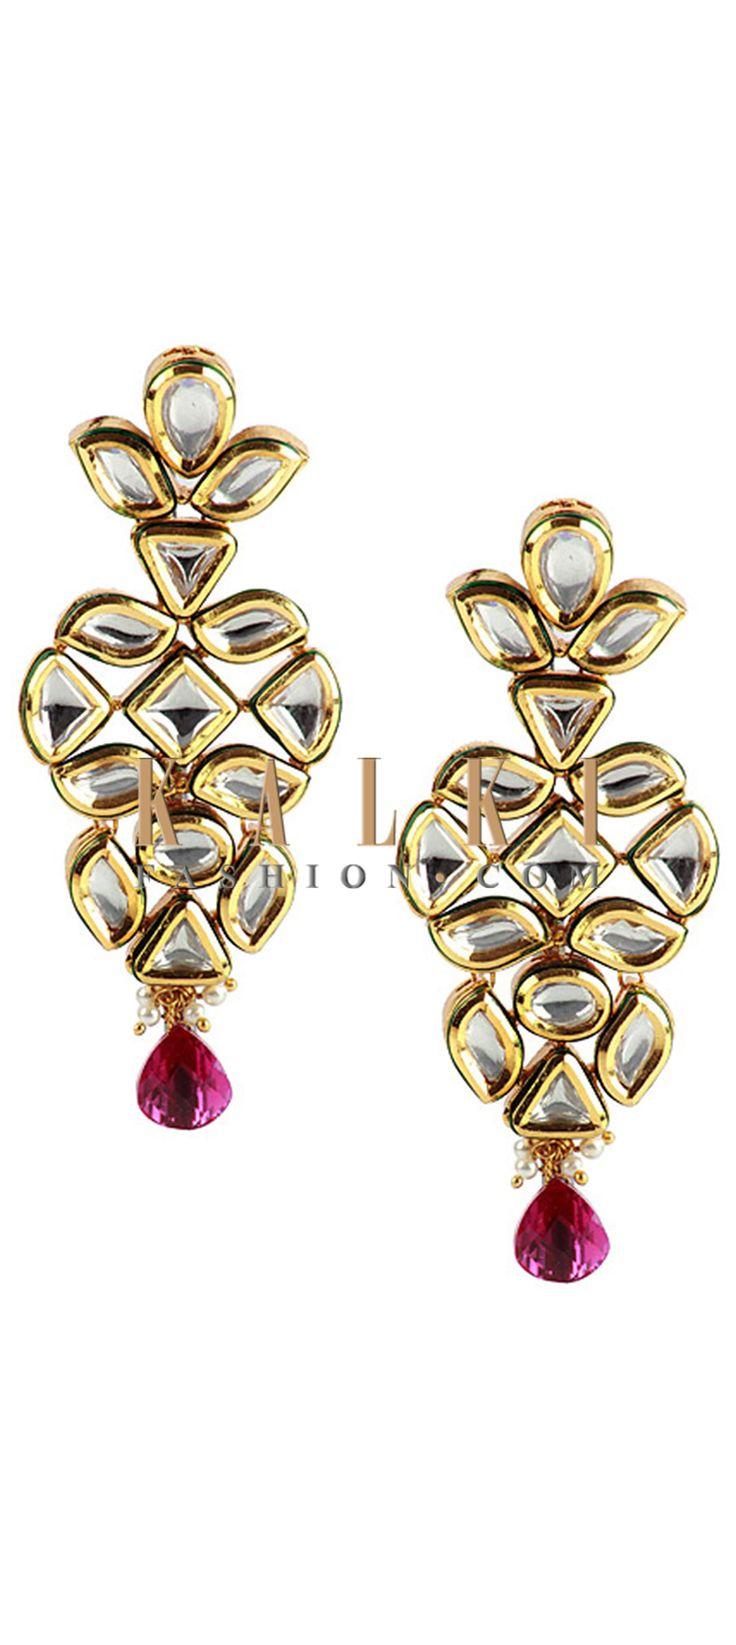 Buy Online from the link below http://www.kalkifashion.com/kundan-polki-studded-danglers.html